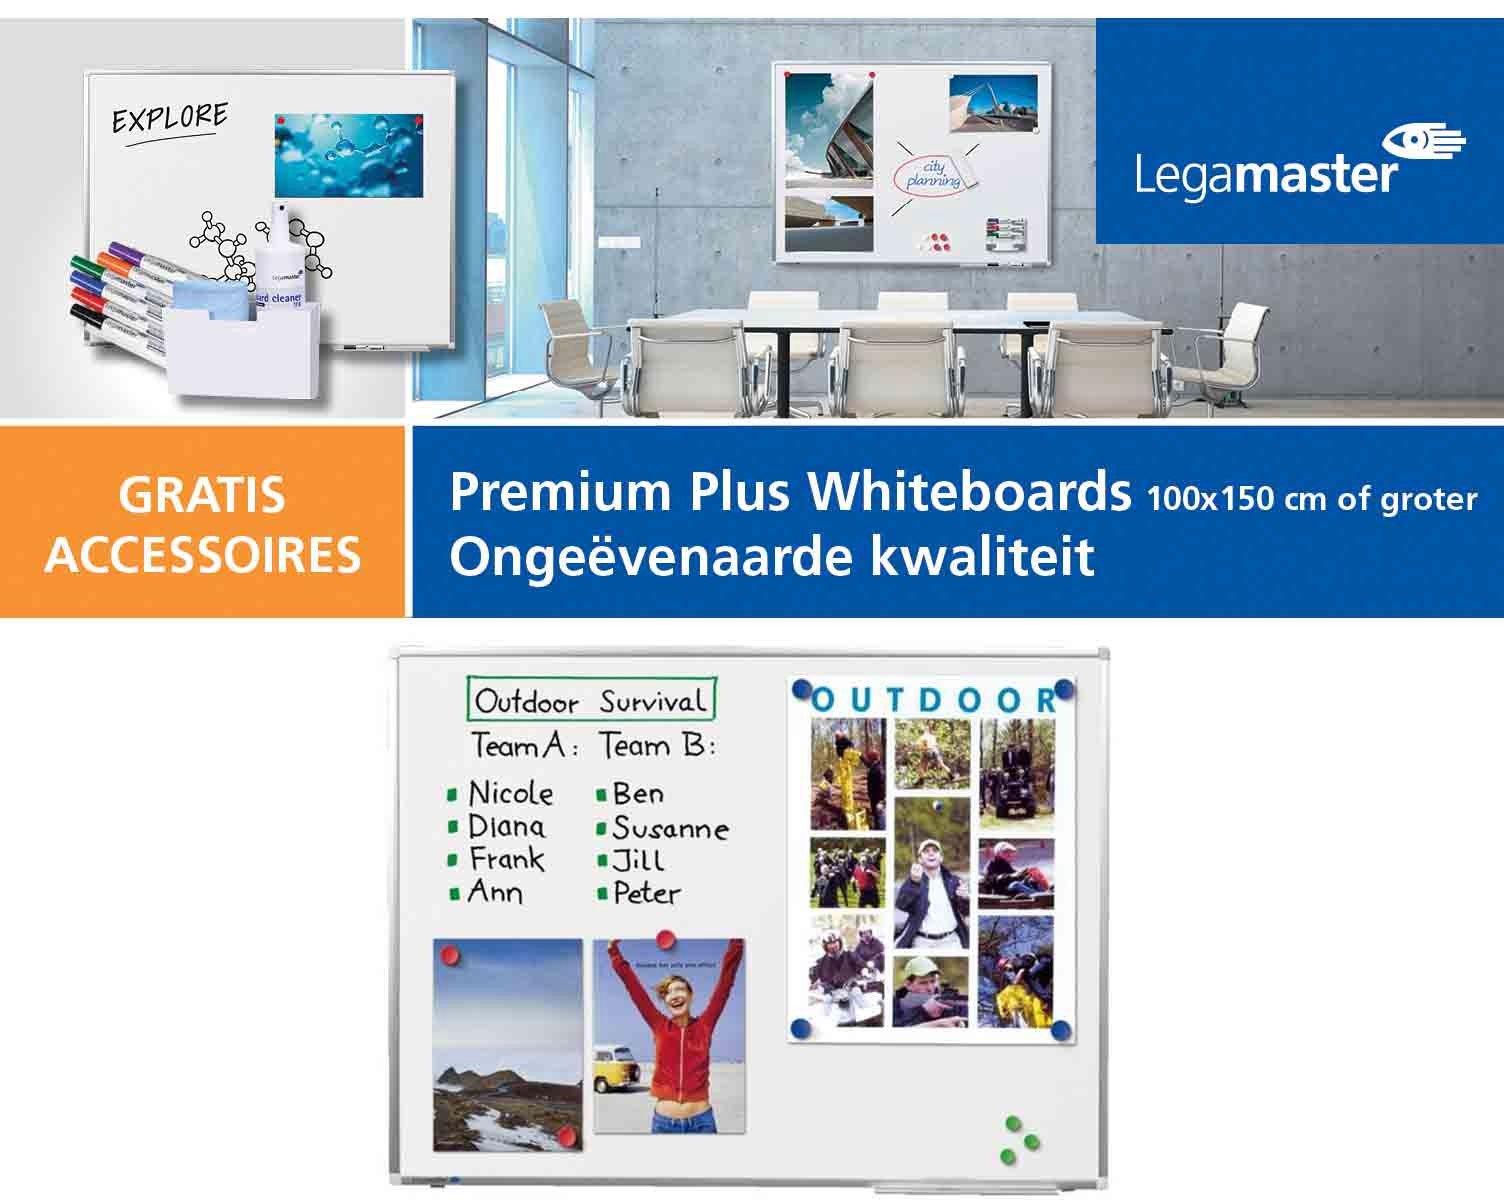 Legamaster actie Whiteboard plus accessoires 3.jpg